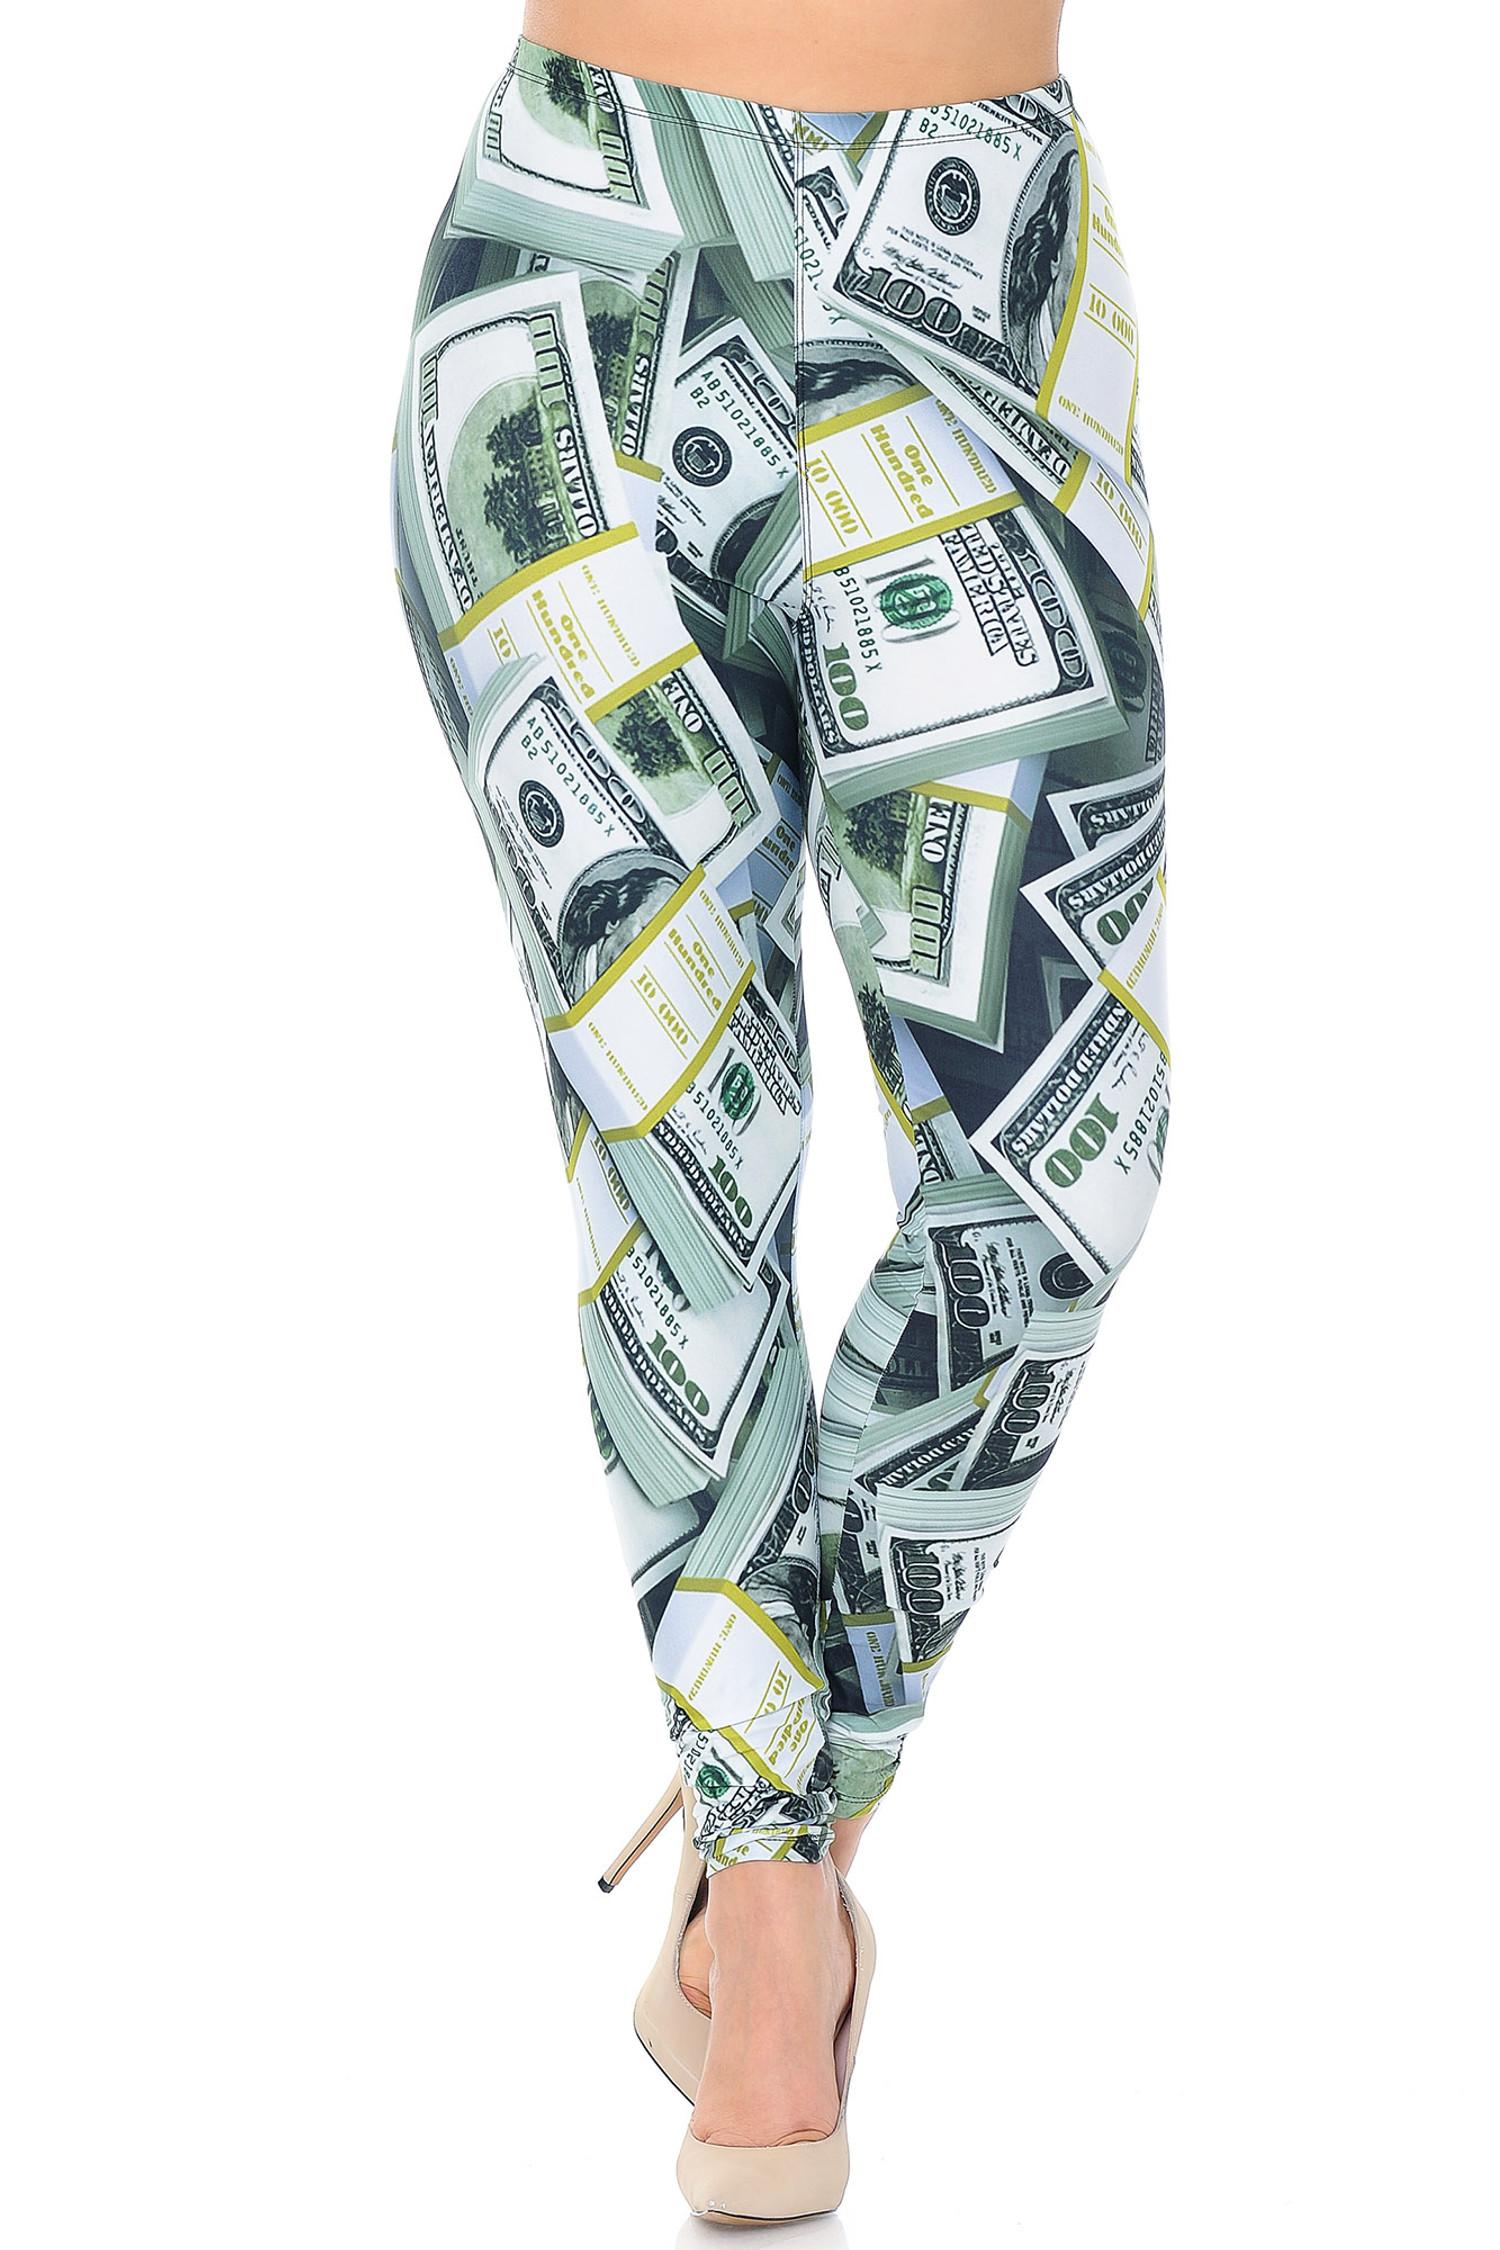 Creamy Soft Cash Money Plus Size Leggings - USA Fashion™